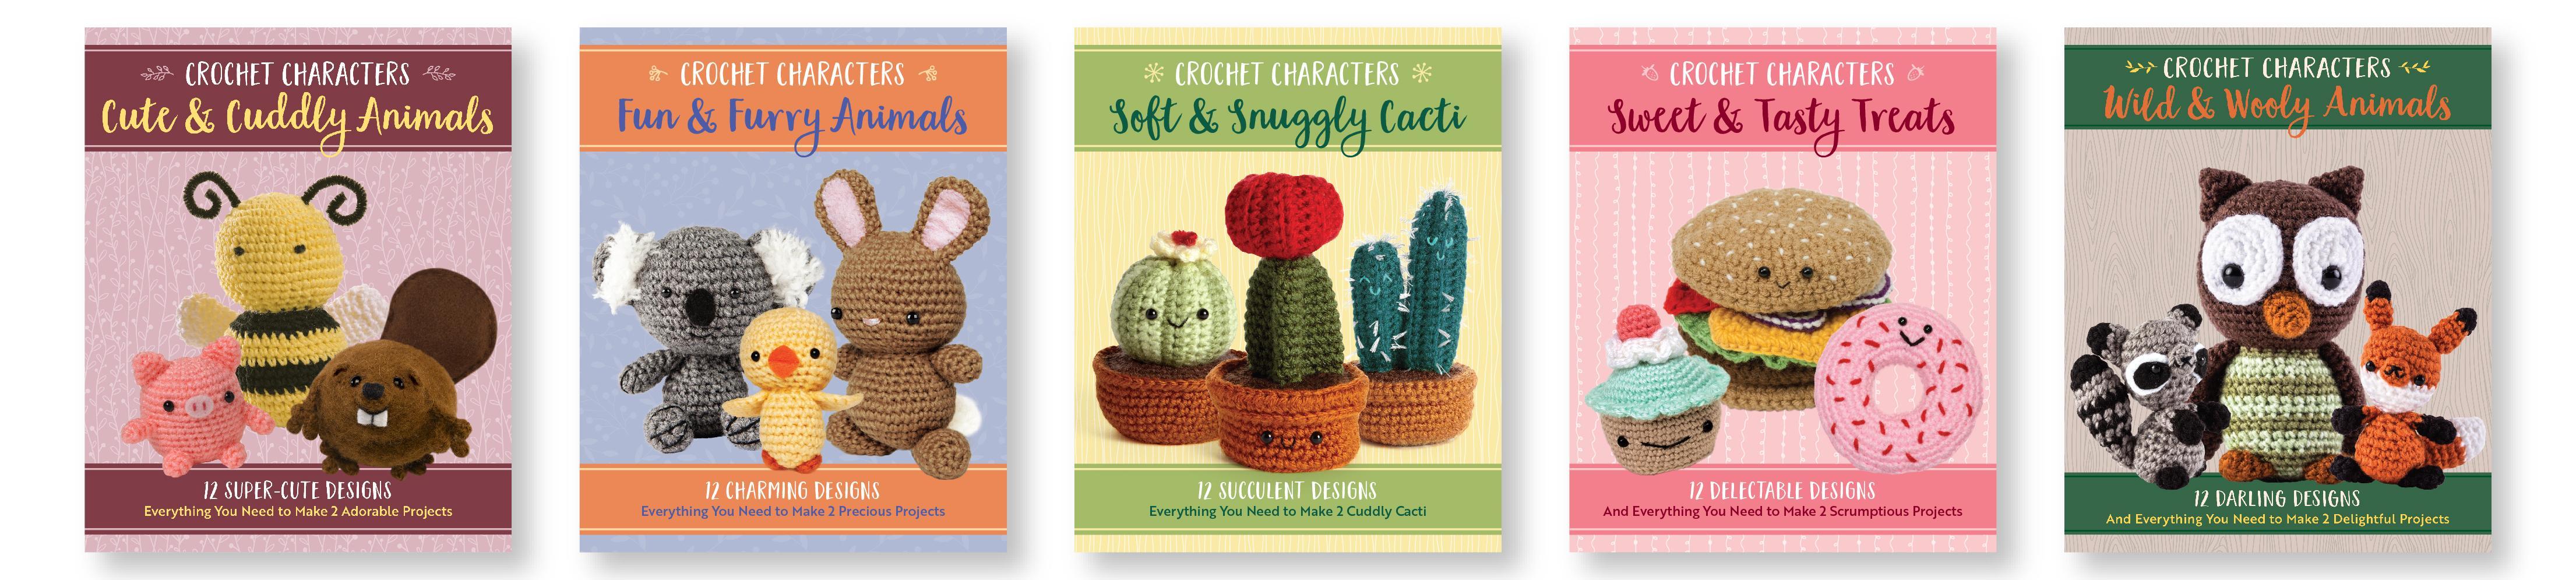 Top 6 Software Programs for Crochet | 995x4421